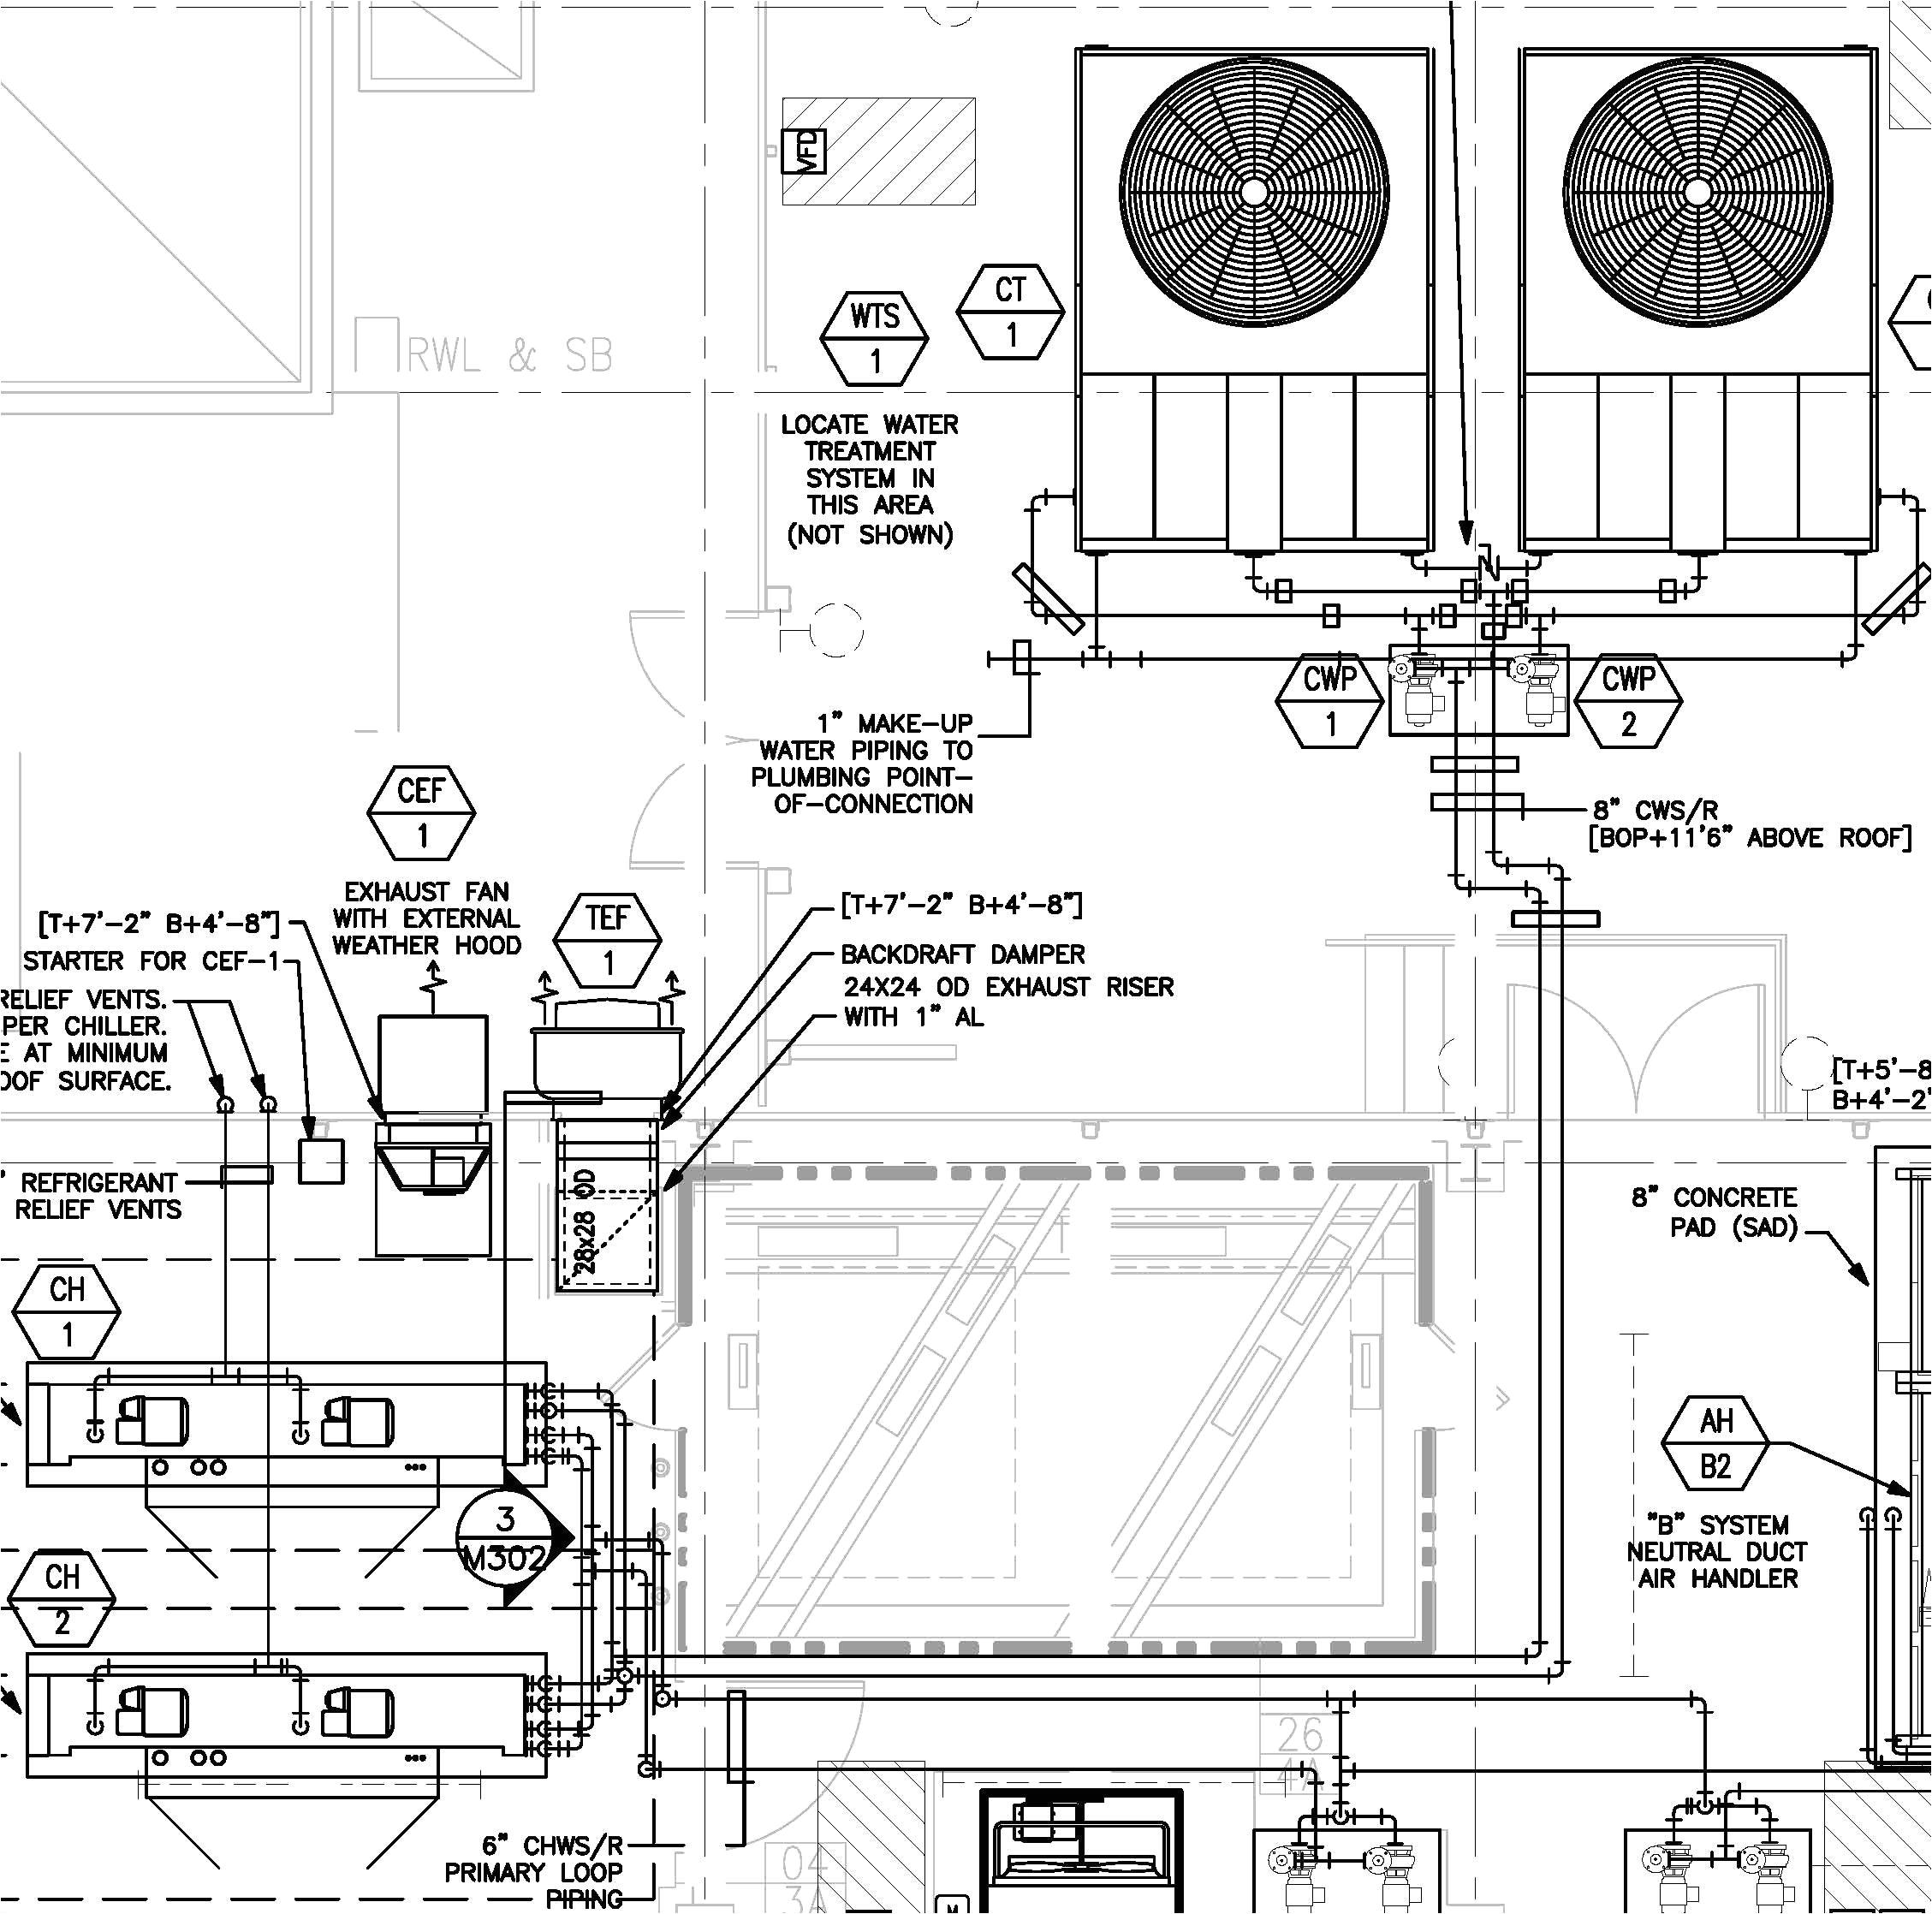 coleman travel trailers floor plans together with coleman tentcoleman air handler wiring diagram 16